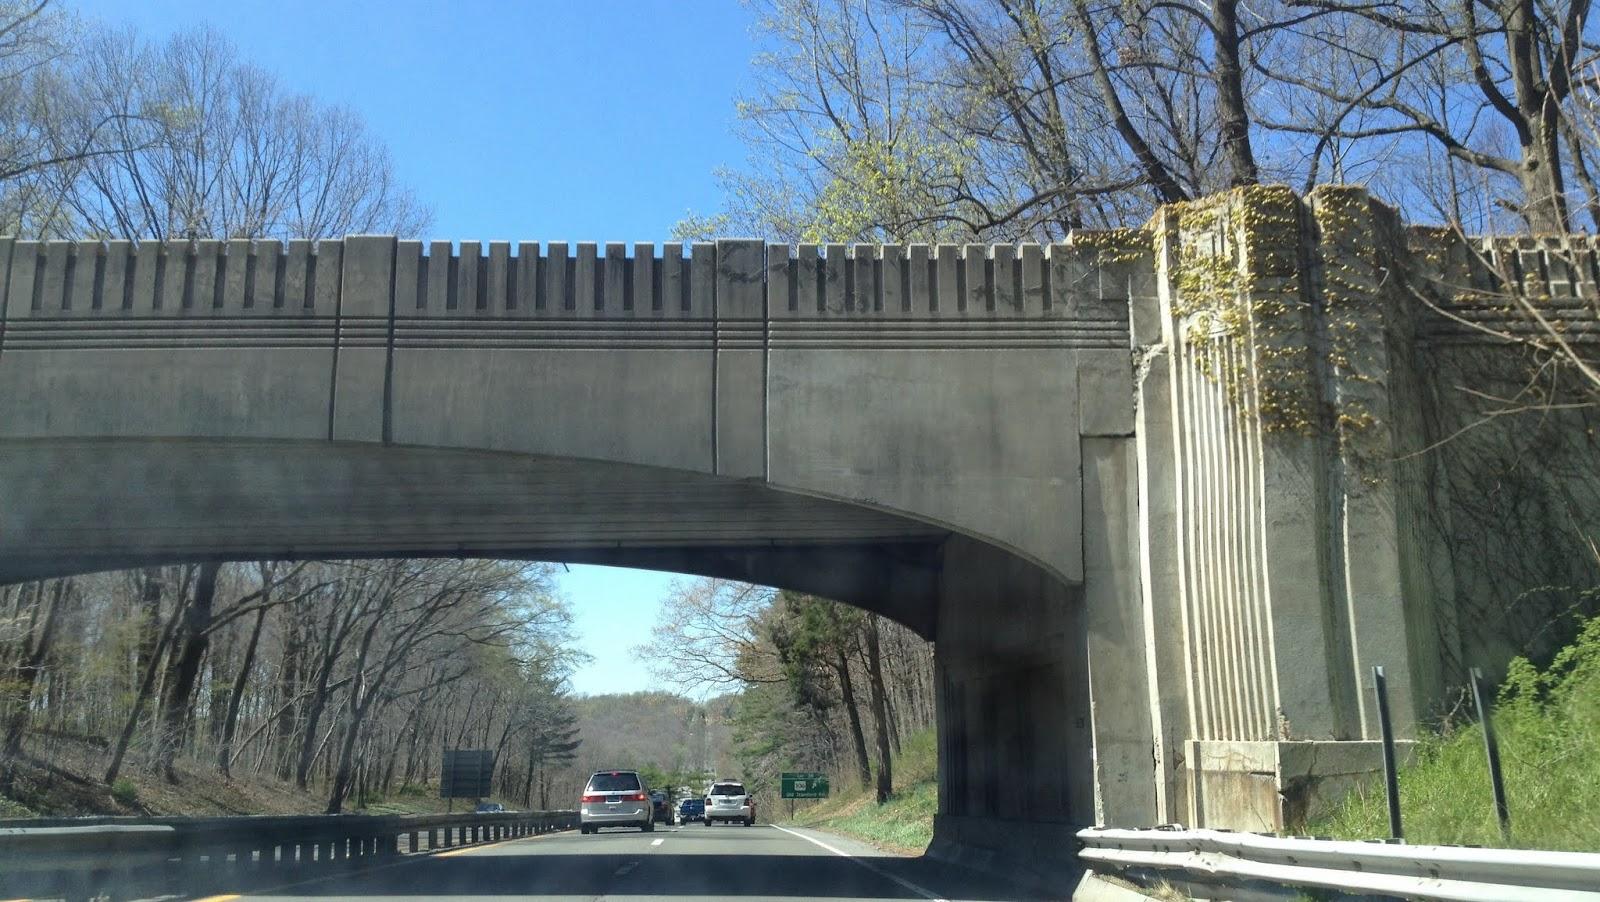 Life, On A Bridged: Merritt Parkway, Greenwich, CT